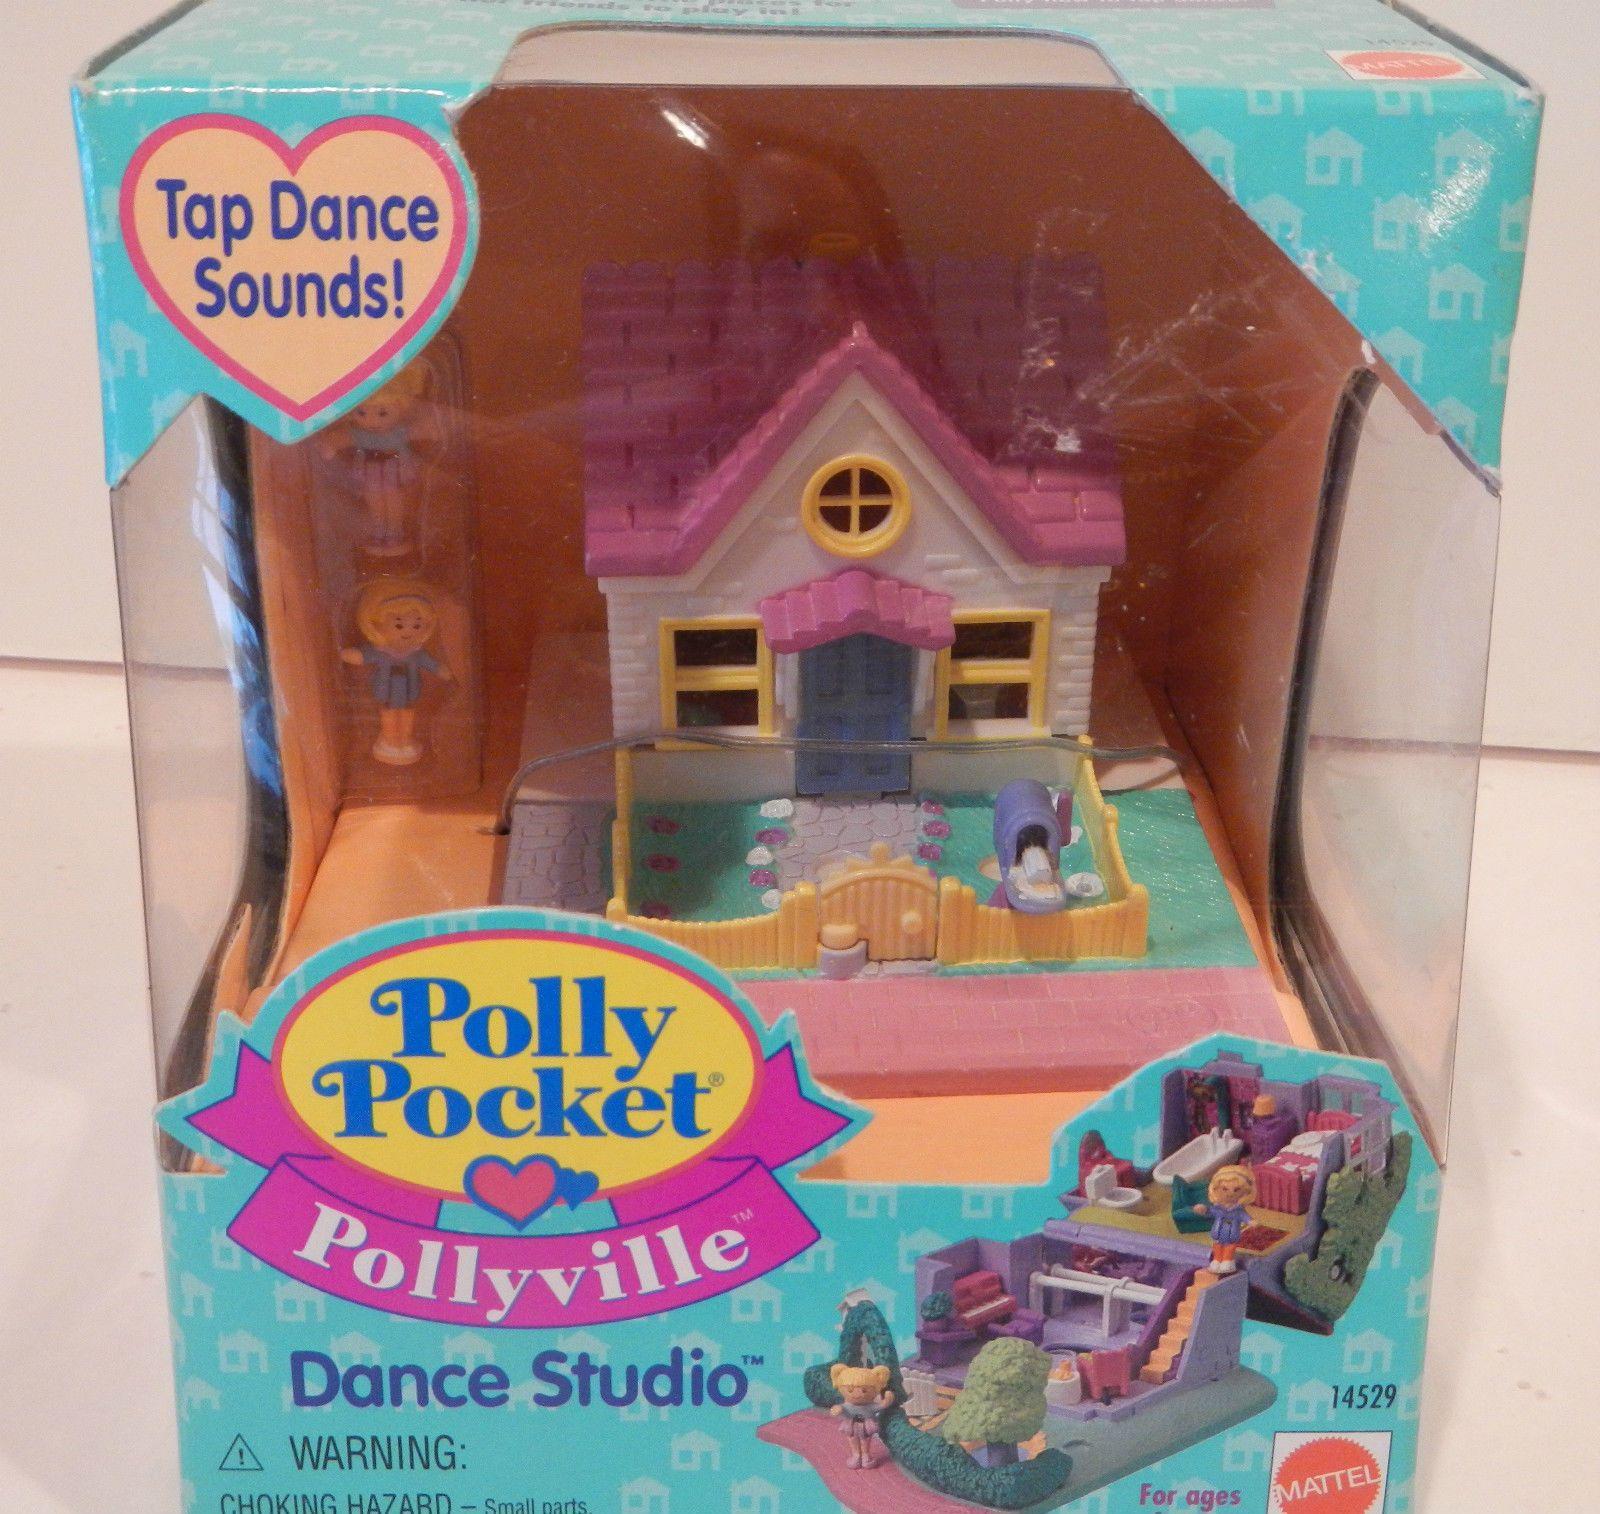 Polly Pocket Pollyville Dance Studio